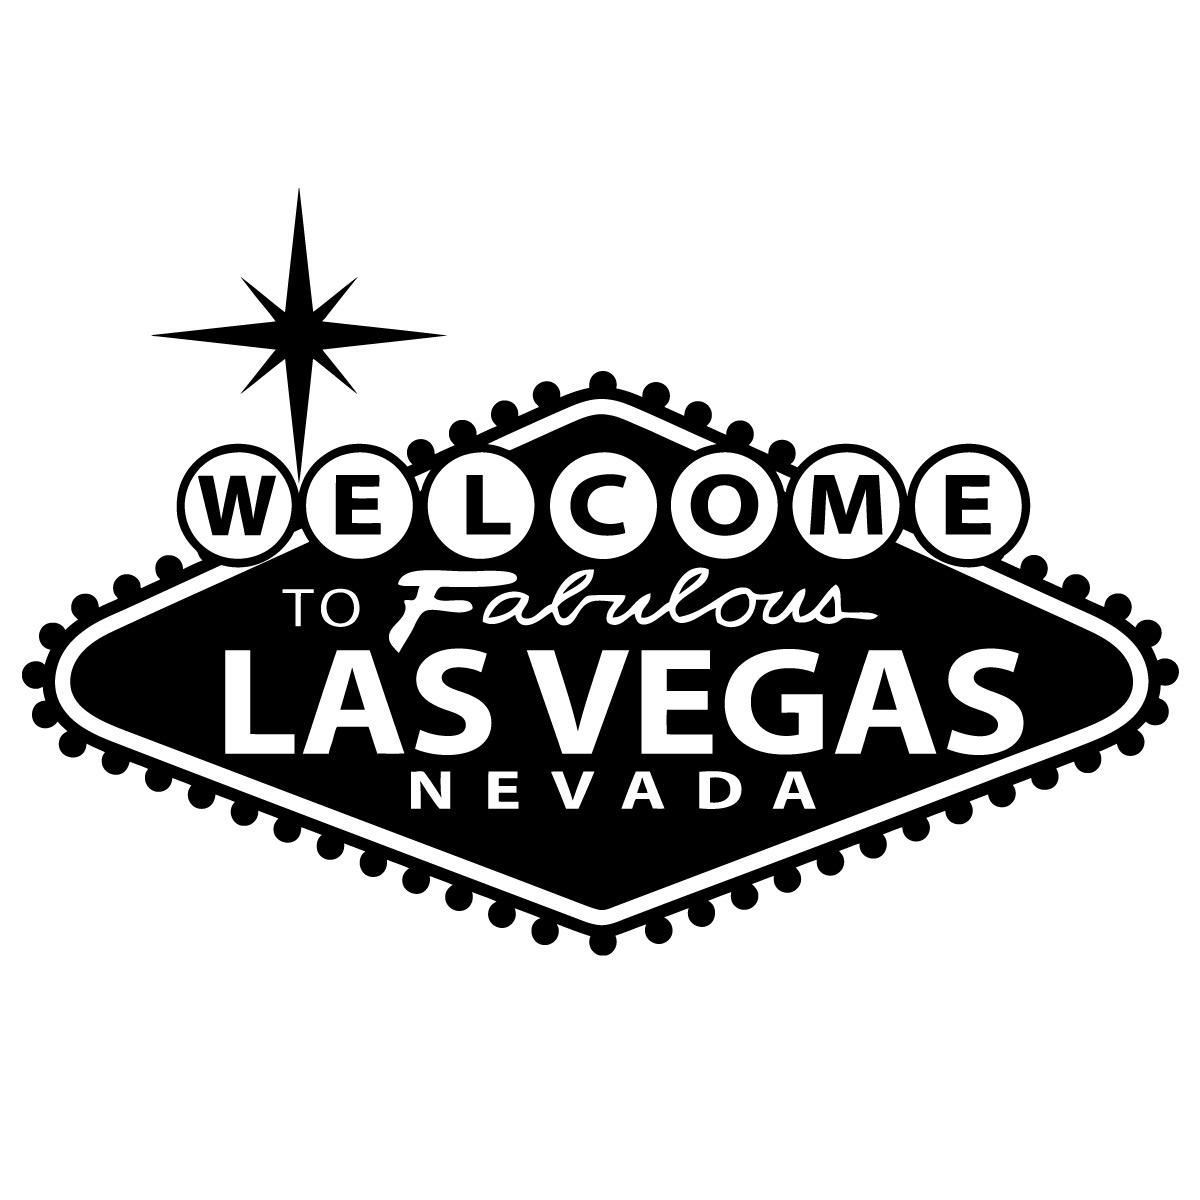 46 X 31 Las Vegas Sign Vinyl Bedroom Wall Art